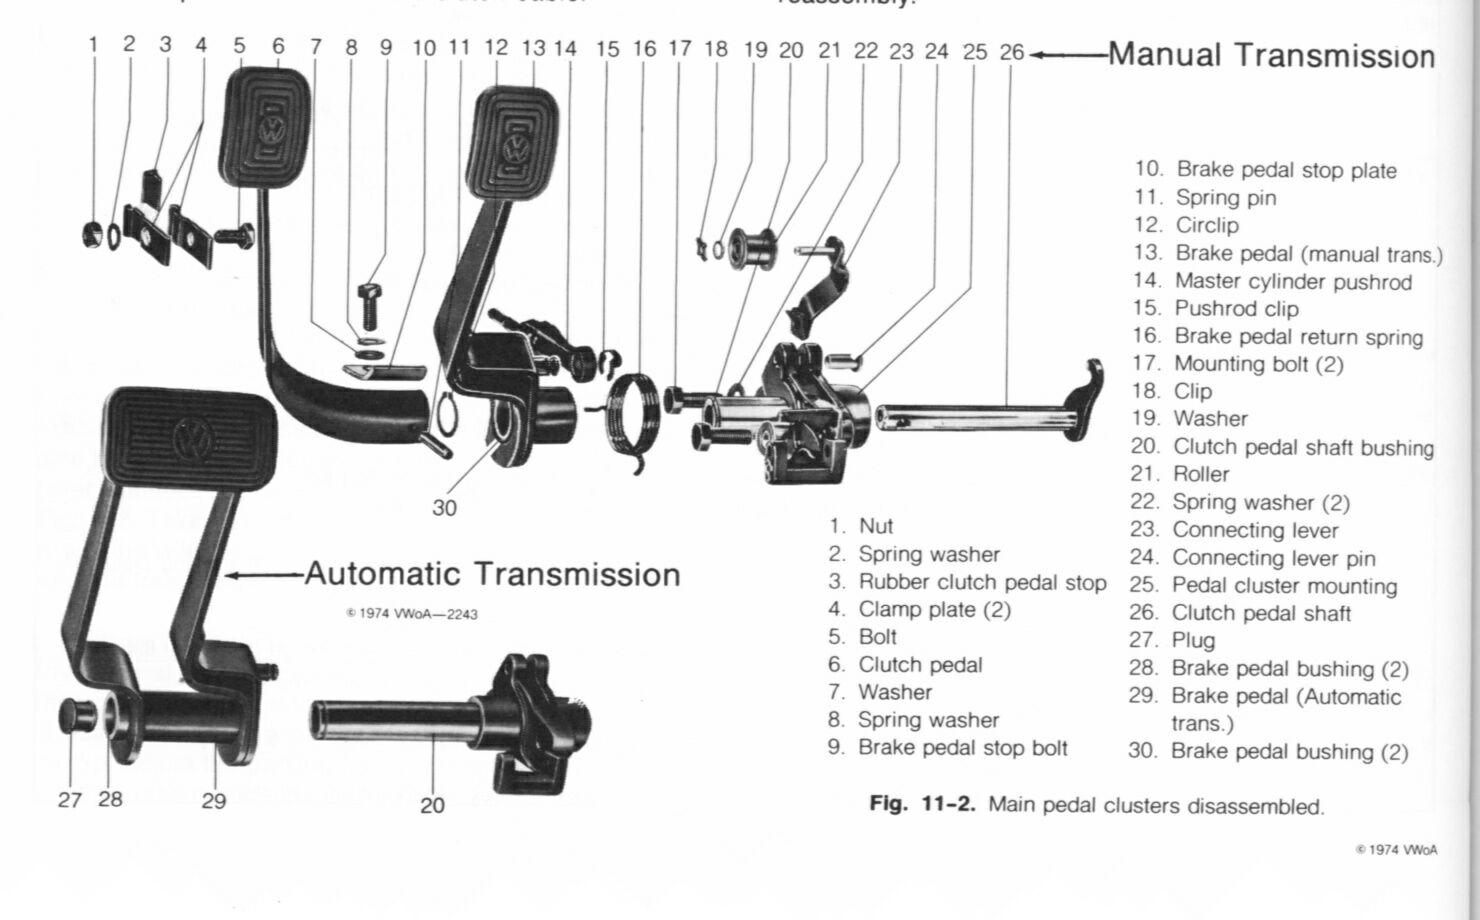 clutch cable replacement rh vw resource com vw golf clutch diagram Volkswagen Van Drawing